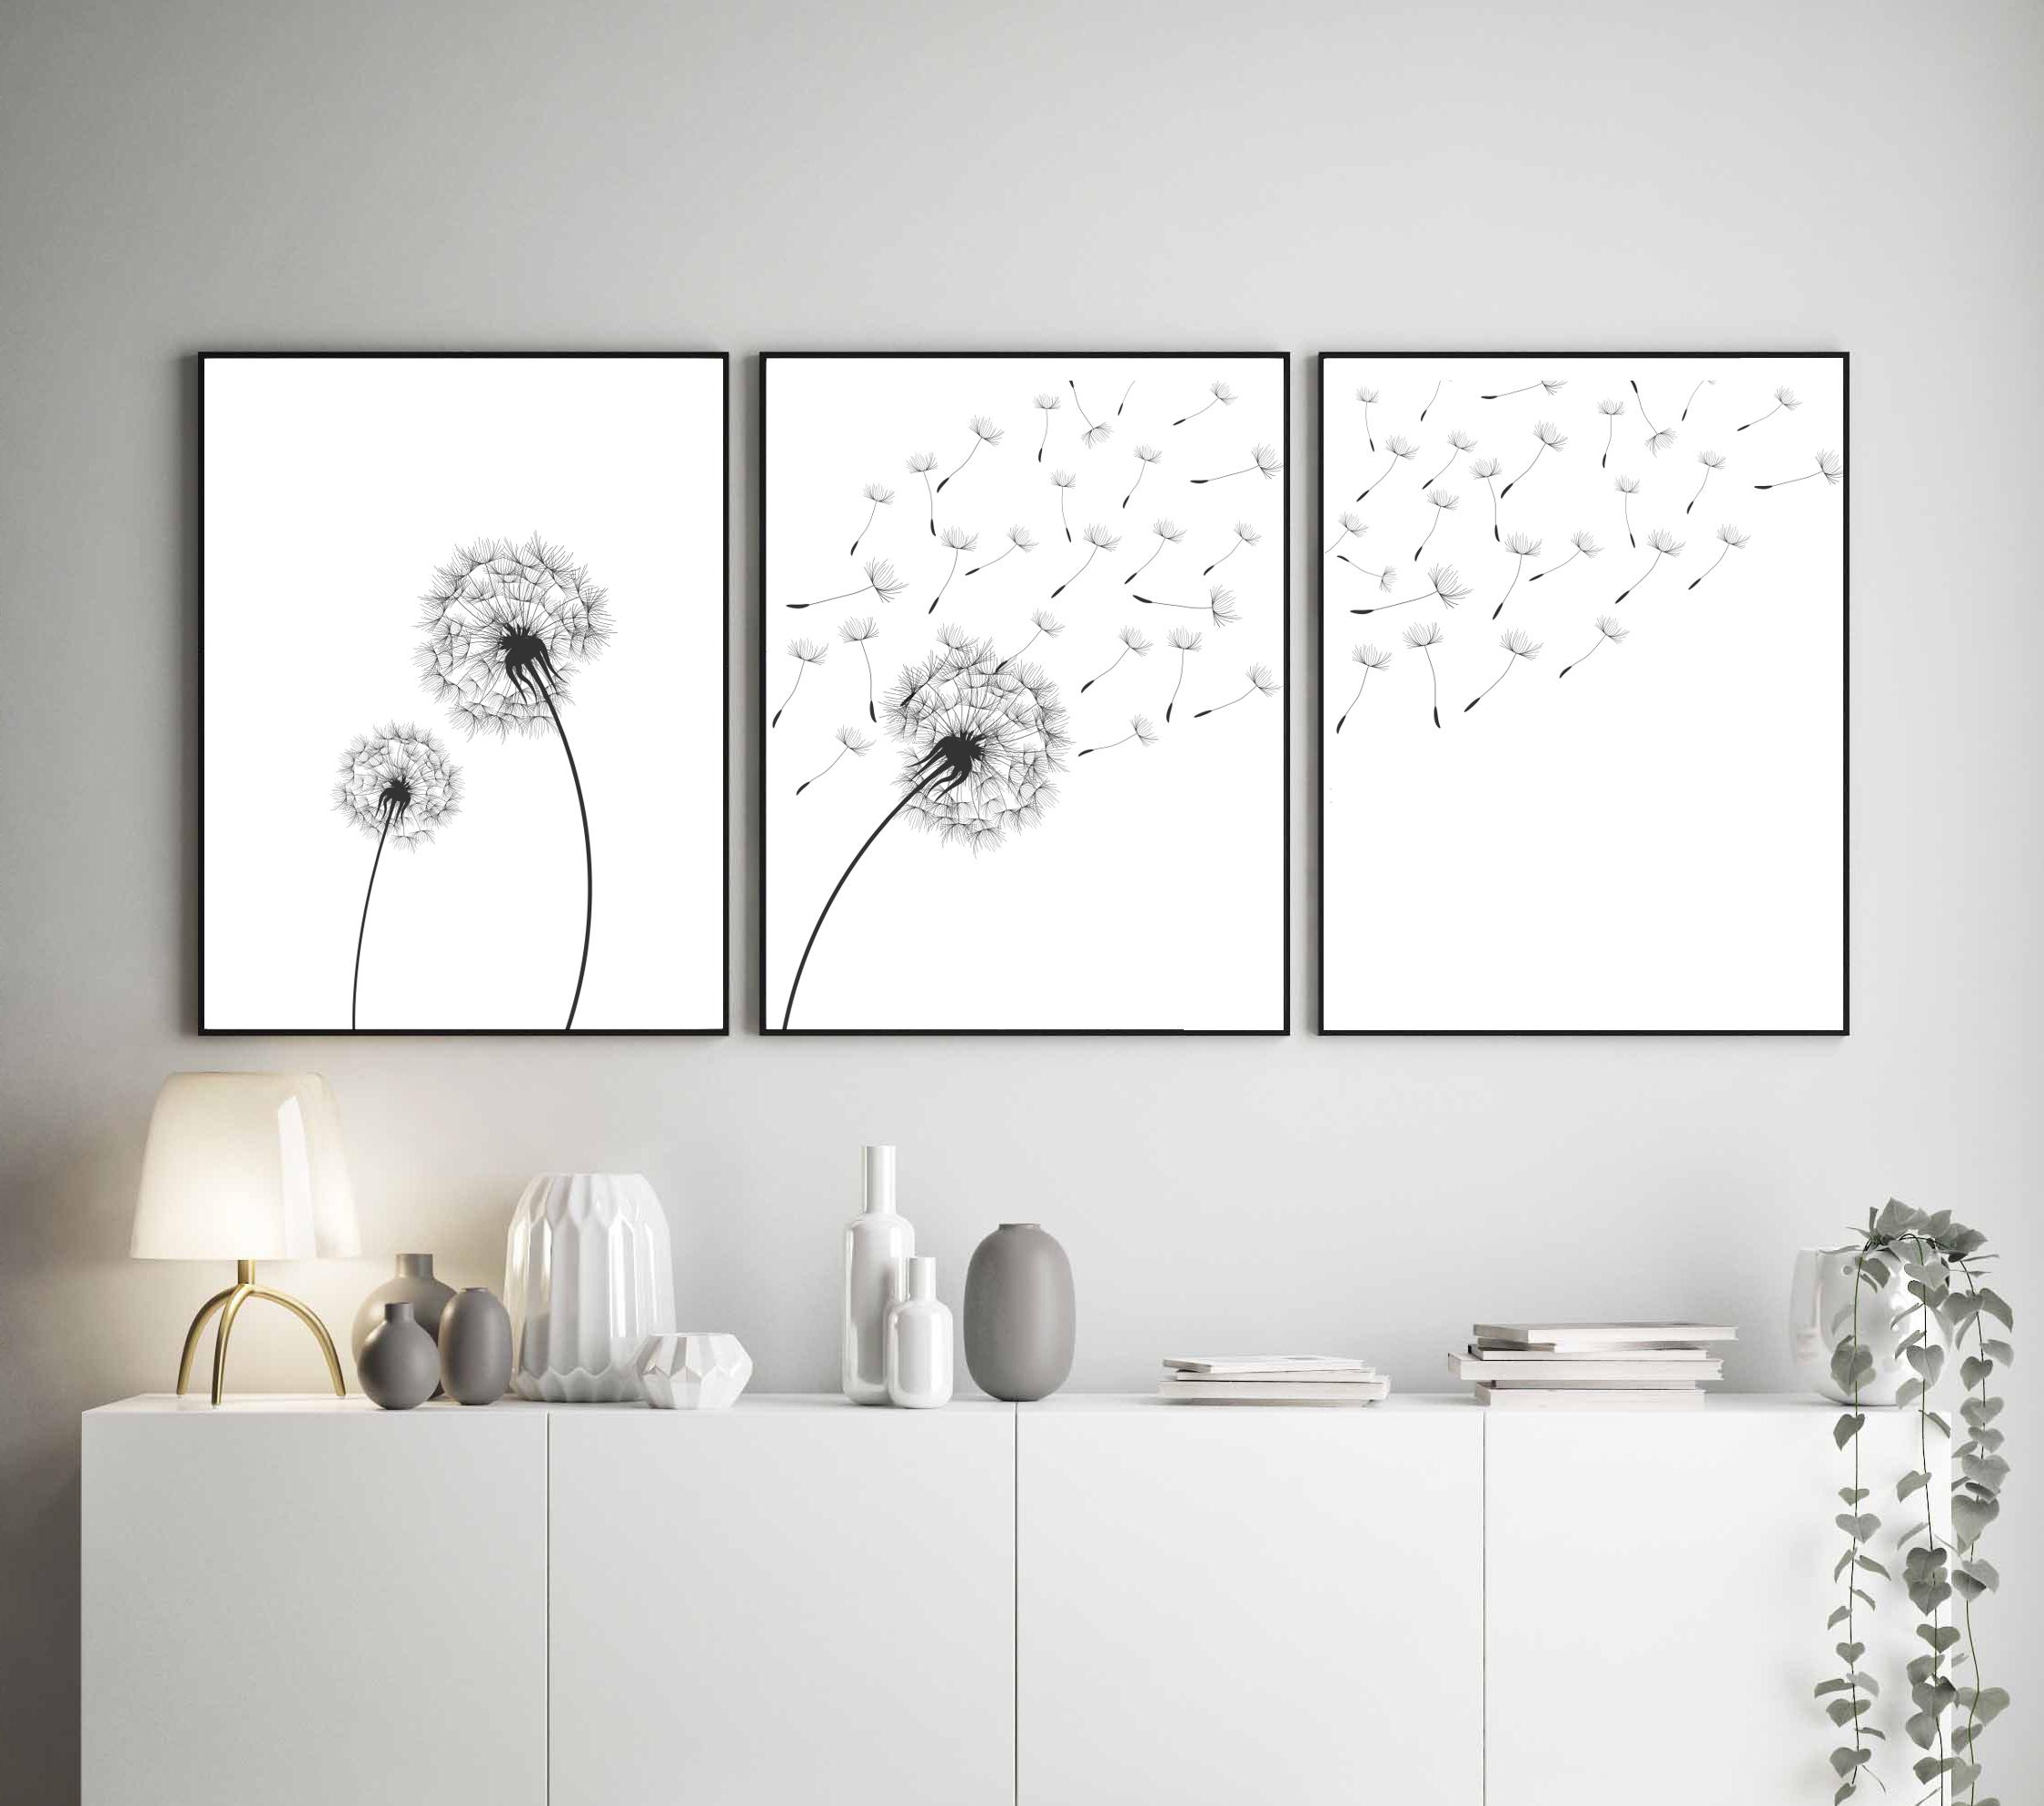 Dandelion Wall Art Print Set Of 3 Prints Poster Living Room Bedroom Decor Black White 12 Sold By Sunshine Store Finds On Storenvy